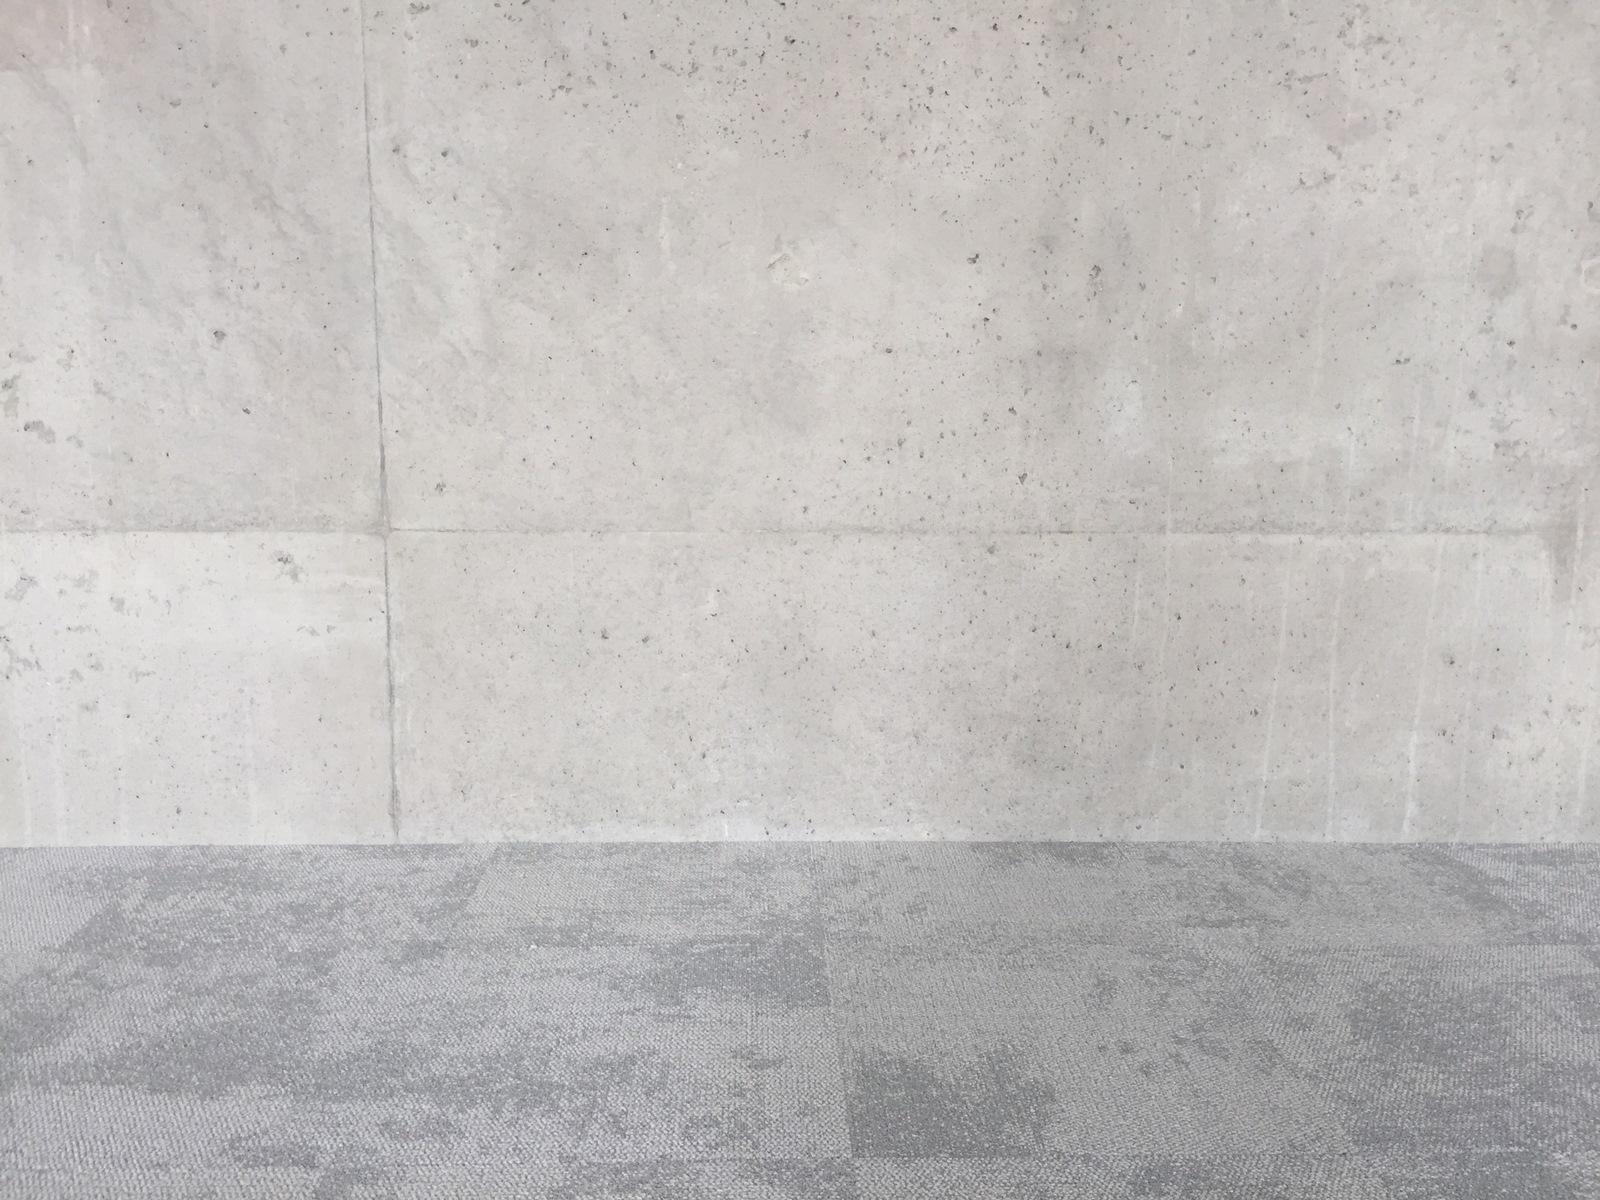 Siège ABB - Beynost : détail façade - Z Architecture